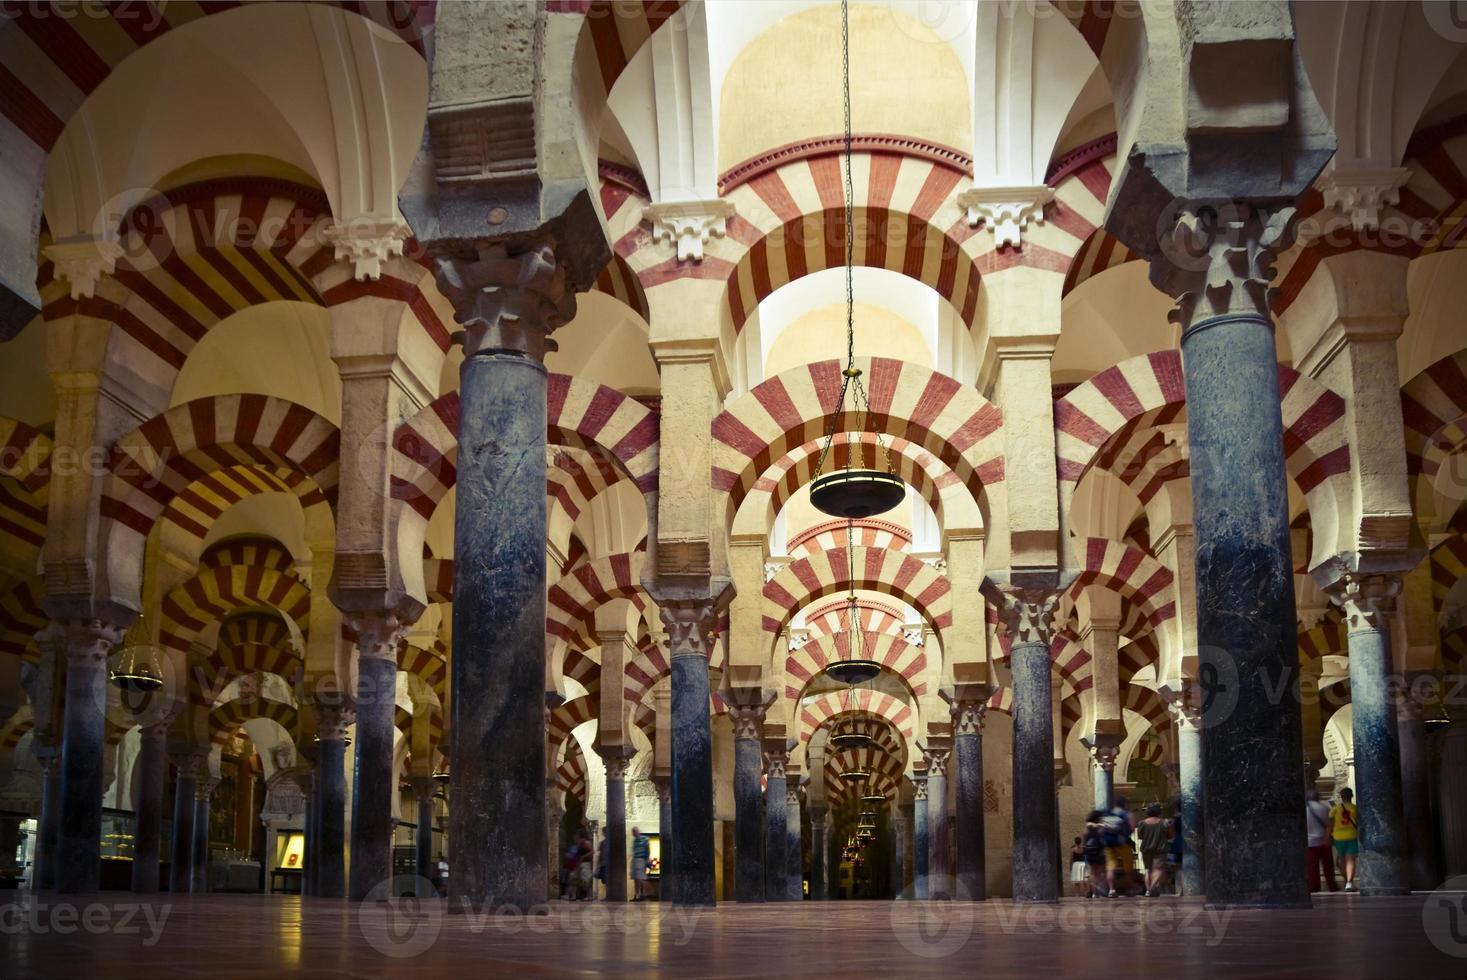 Inside the Mezquita photo